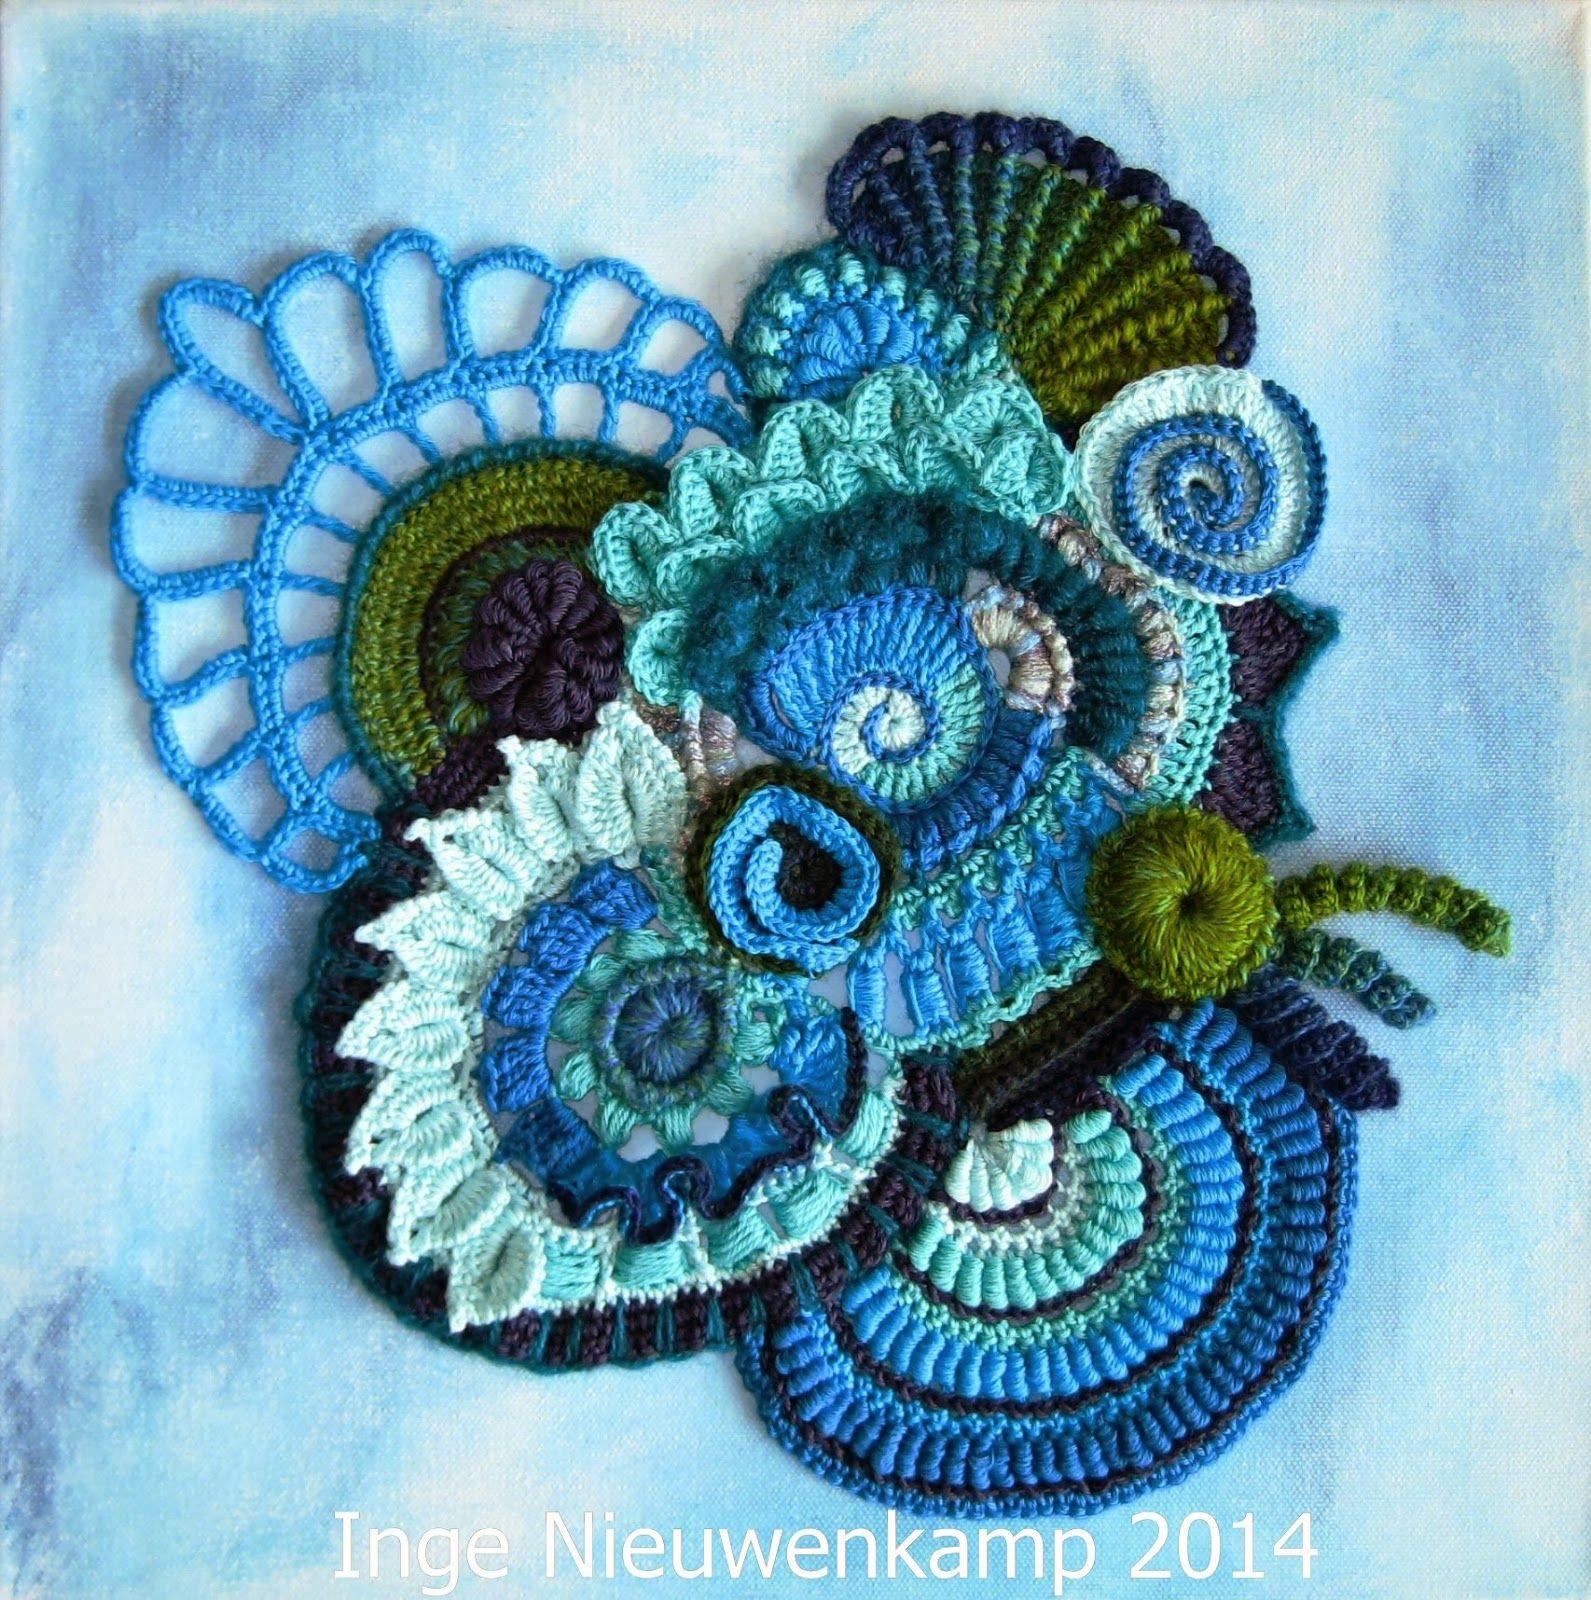 Beautiful free form crochet on canvas